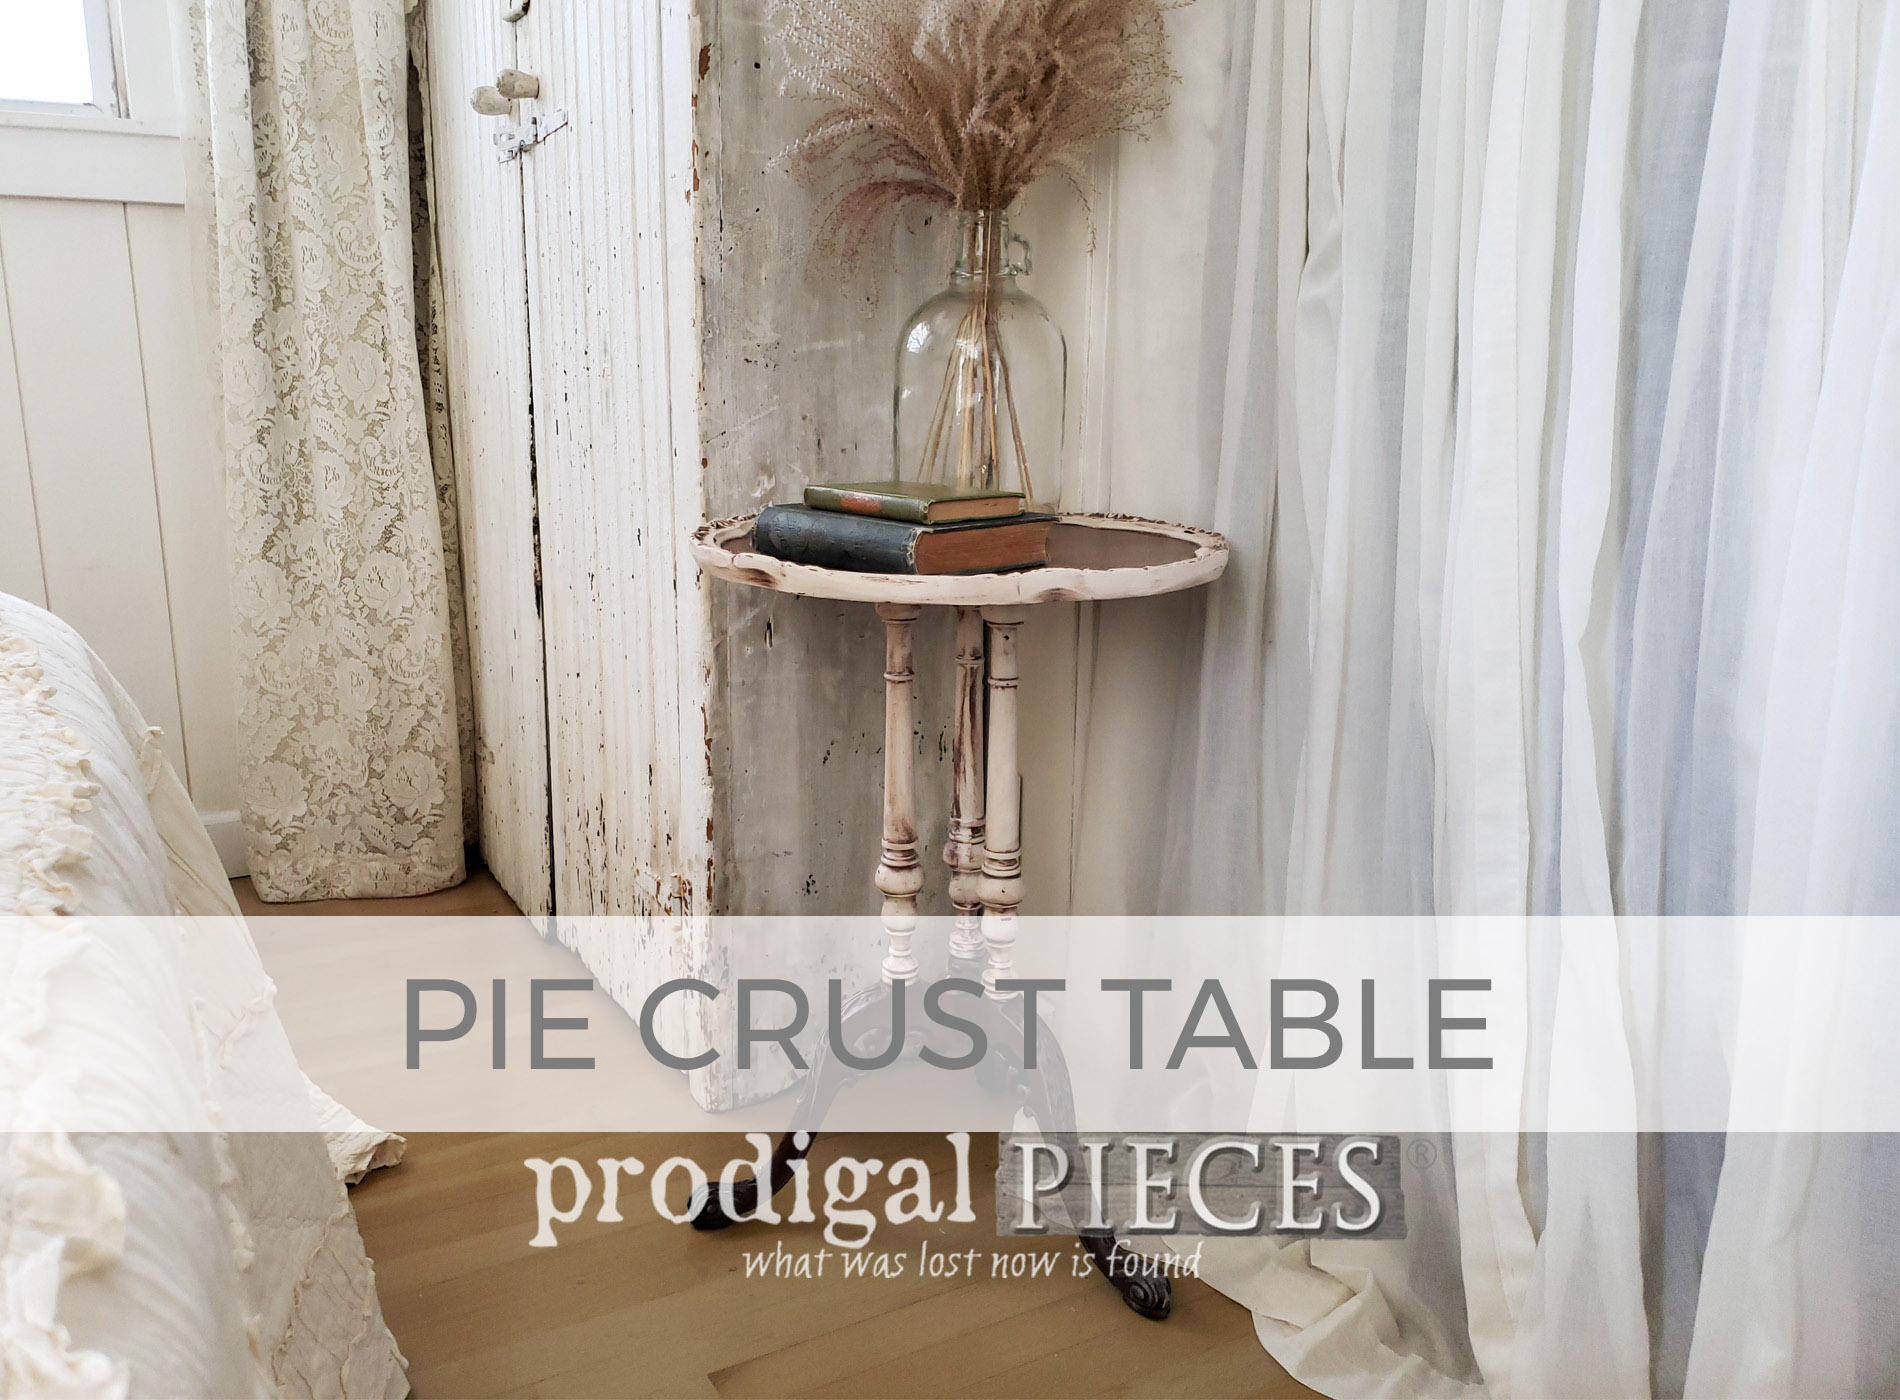 Antique Pie Crust Table by Larissa of Prodigal Pieces | prodigalpieces.com